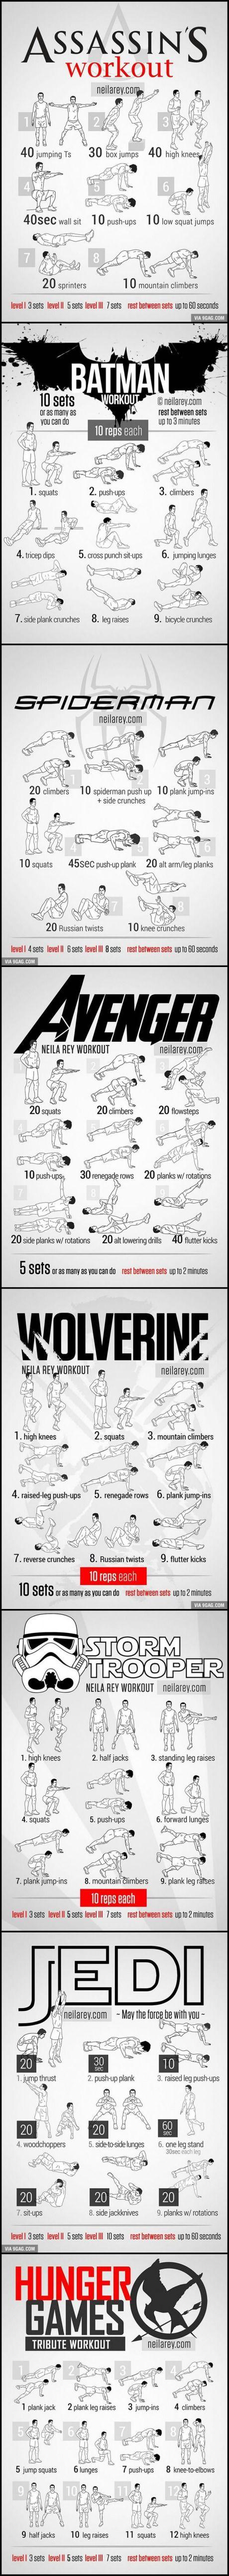 Entraînement pour superhéros / Superheroes workout ♤Melyk